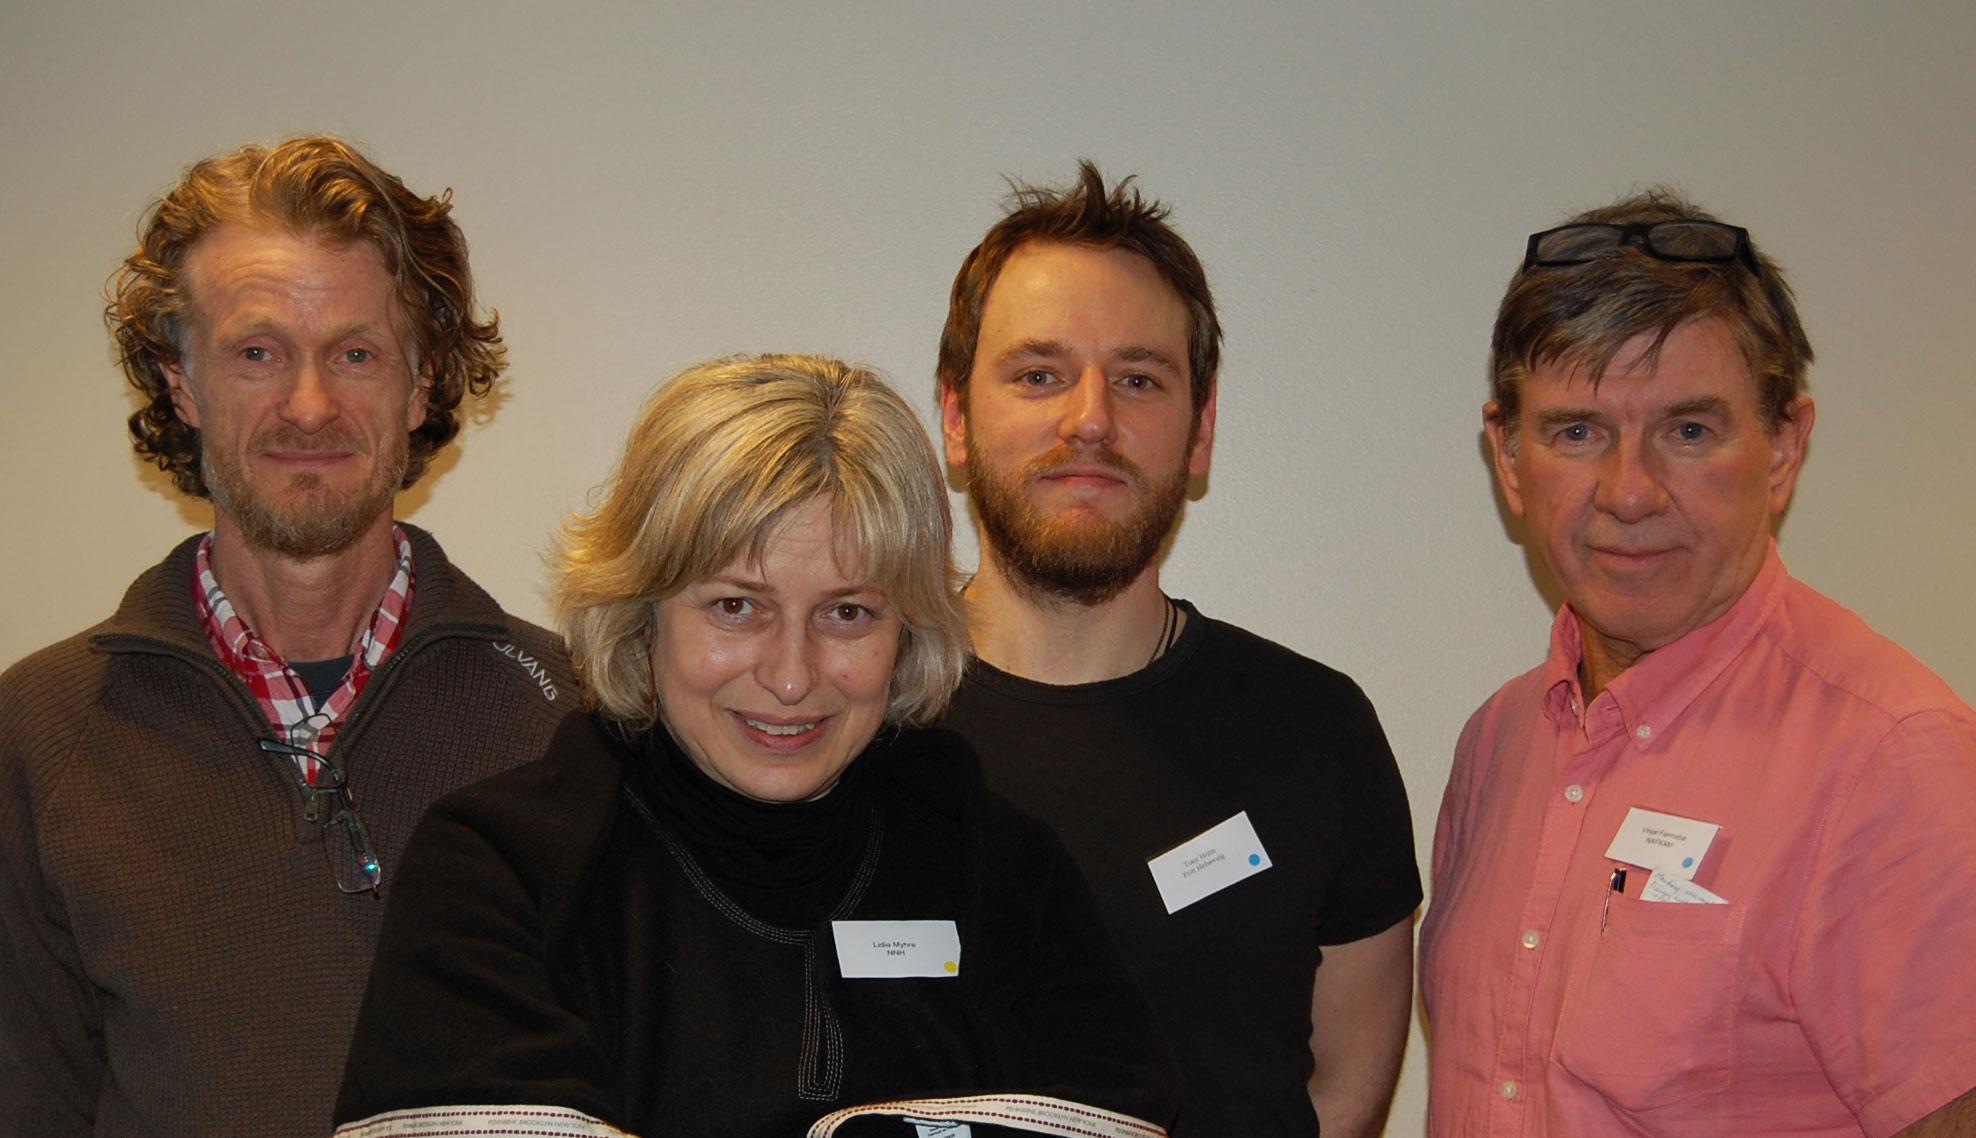 NNHs leder John Petter Lindeland, NNHs generalsekretær Lidia I. Myhre, Tony Holm fra styret i Fritt Helsevalg, og NAFKAM-direktør Vinjar Fønnebø.